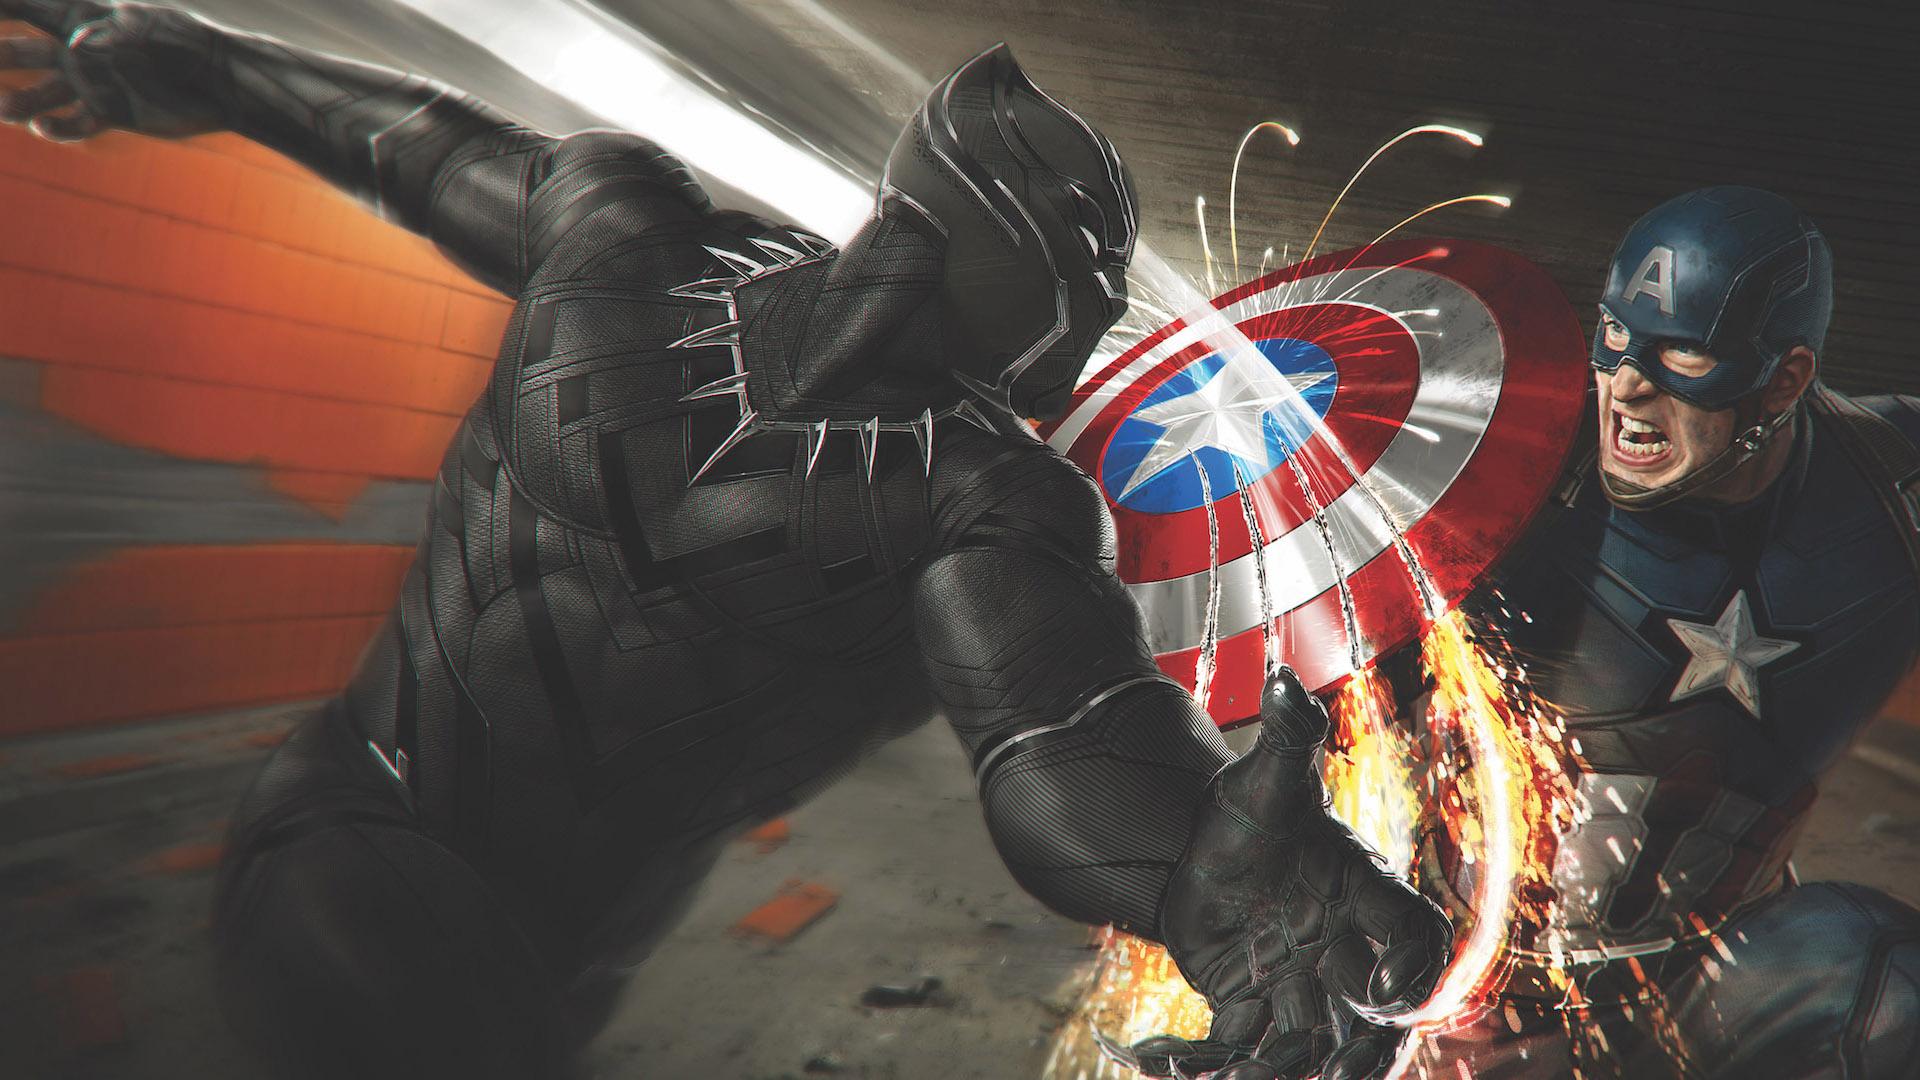 Captain America Vs Black Panther Hd Superheroes 4k Wallpapers